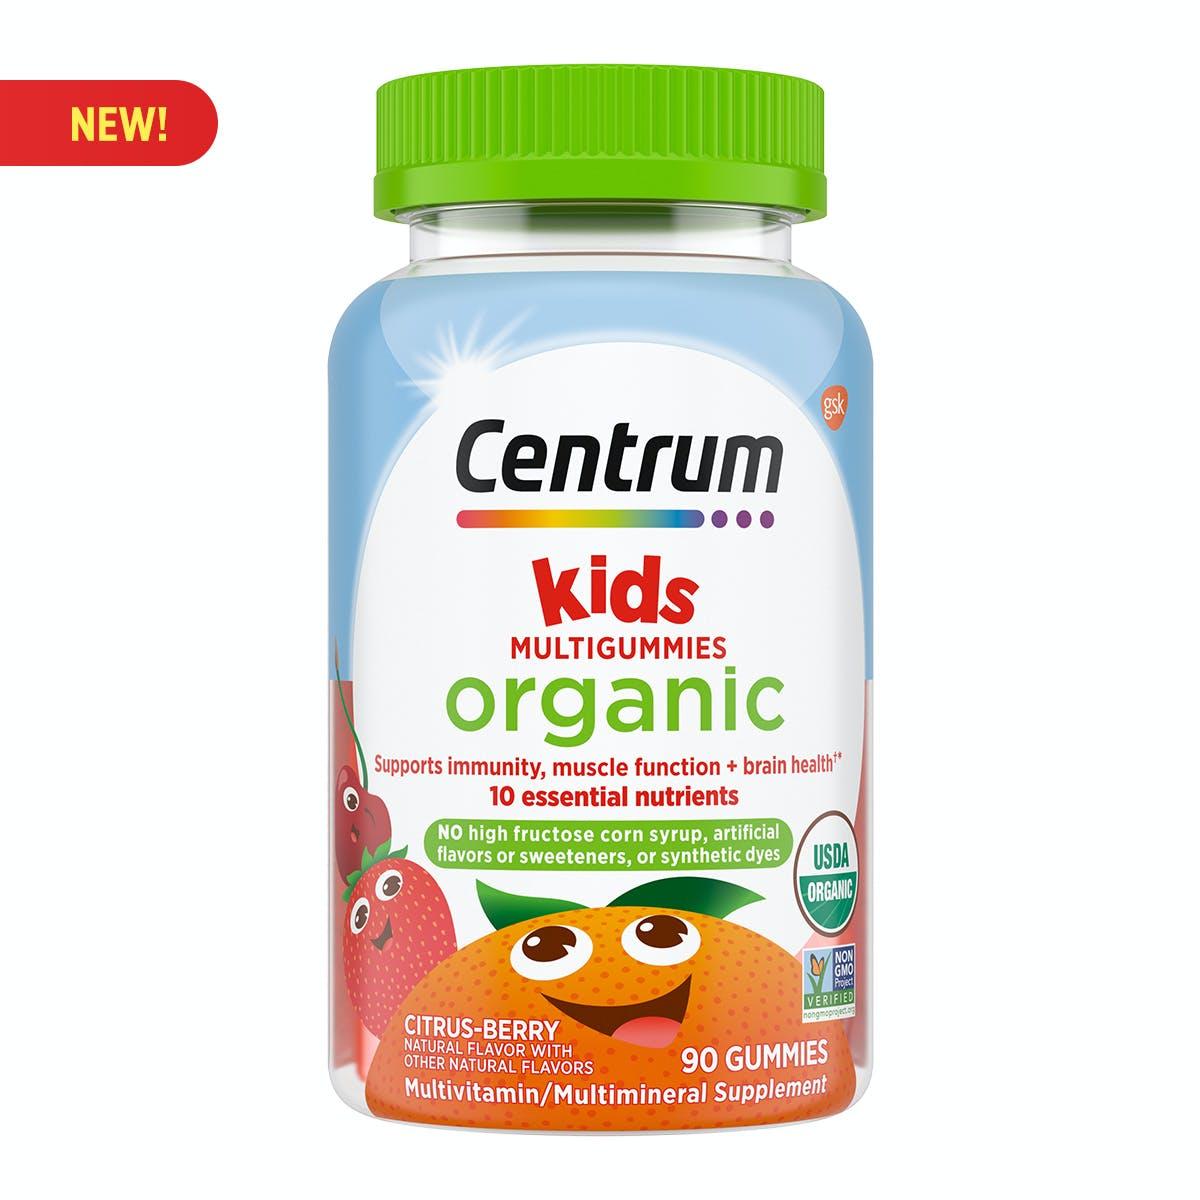 Centrum Organic Kids Multigummies